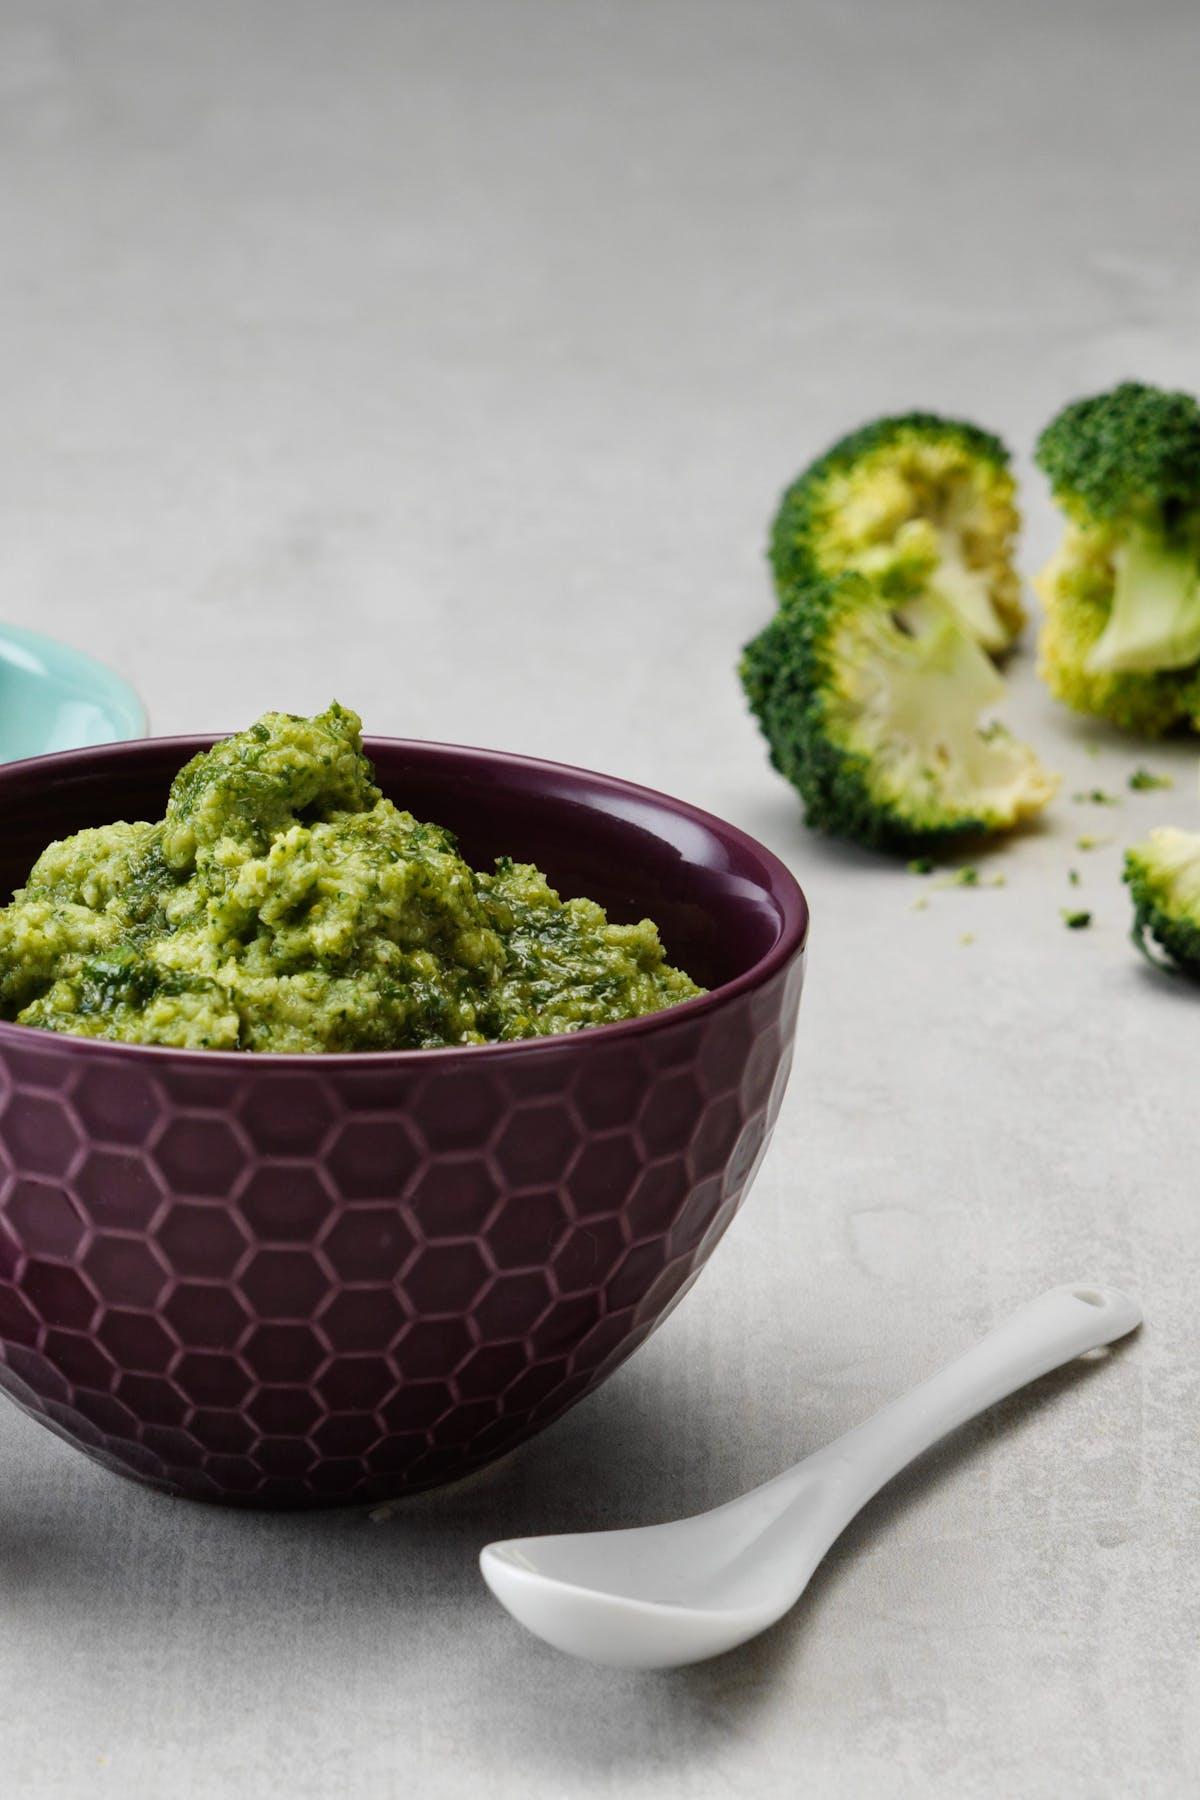 Low-carb broccoli mash